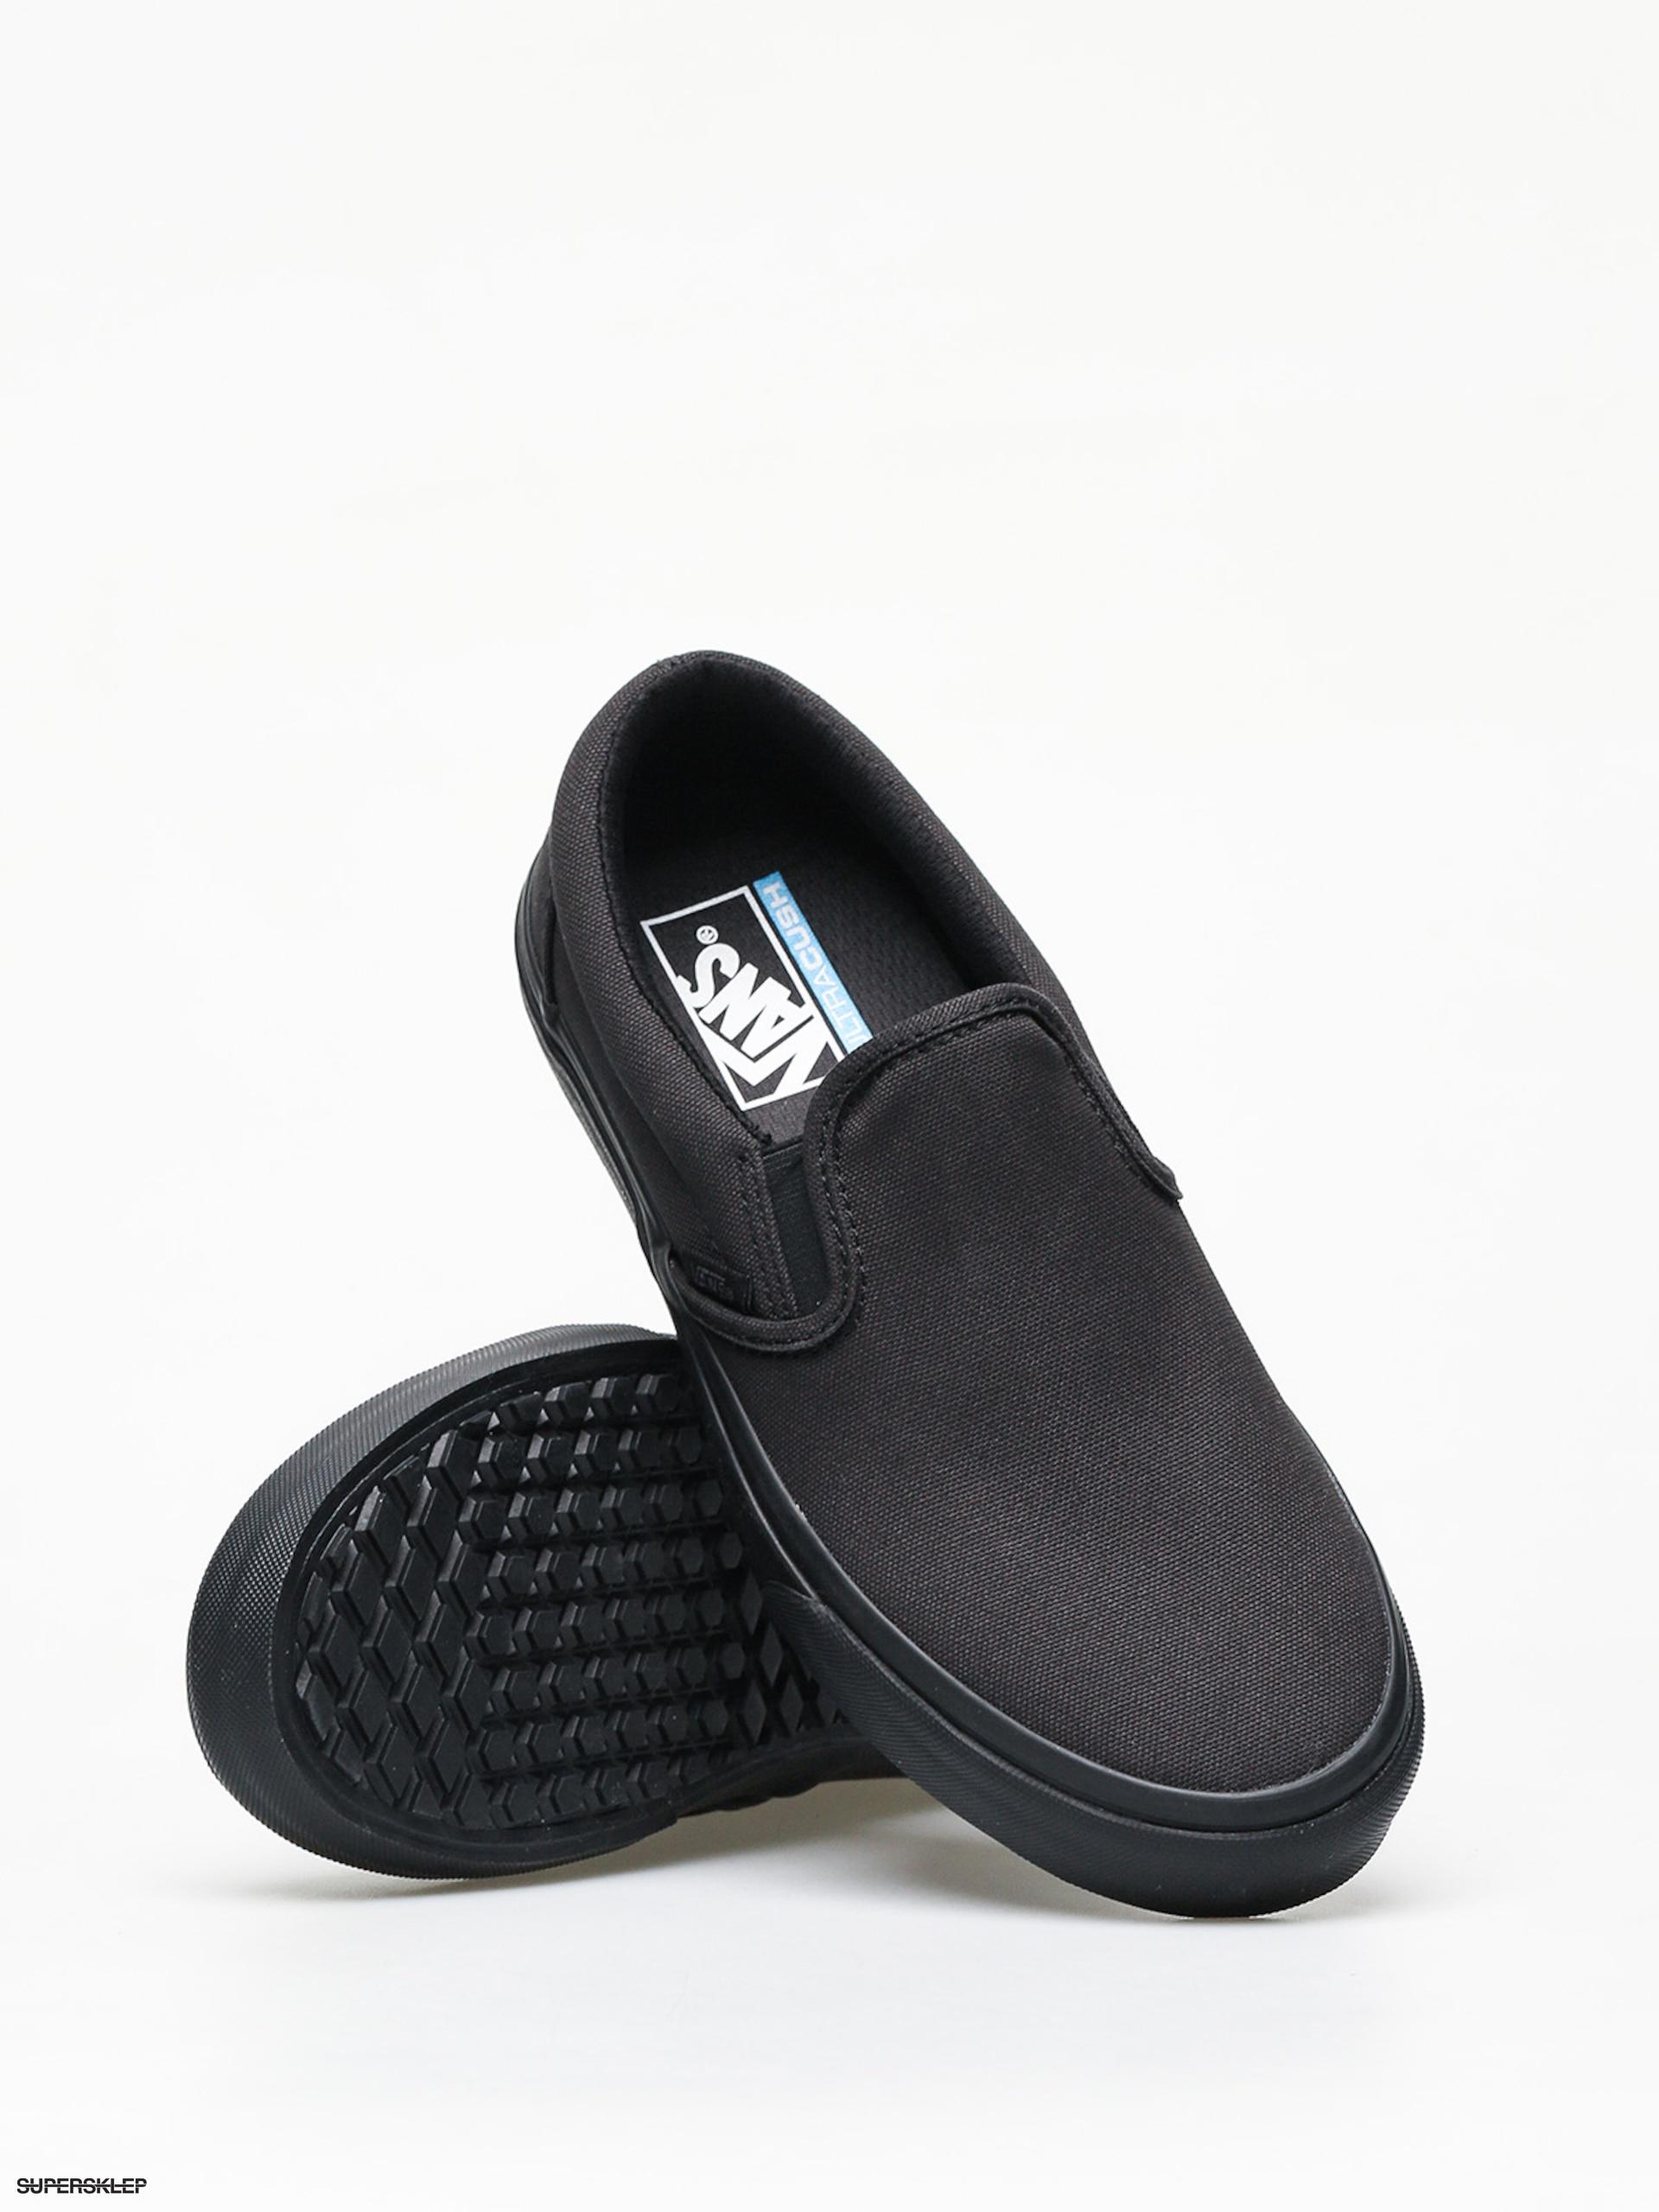 Vans Classic Slip On U (Made For The Makers) Black Black | Footshop